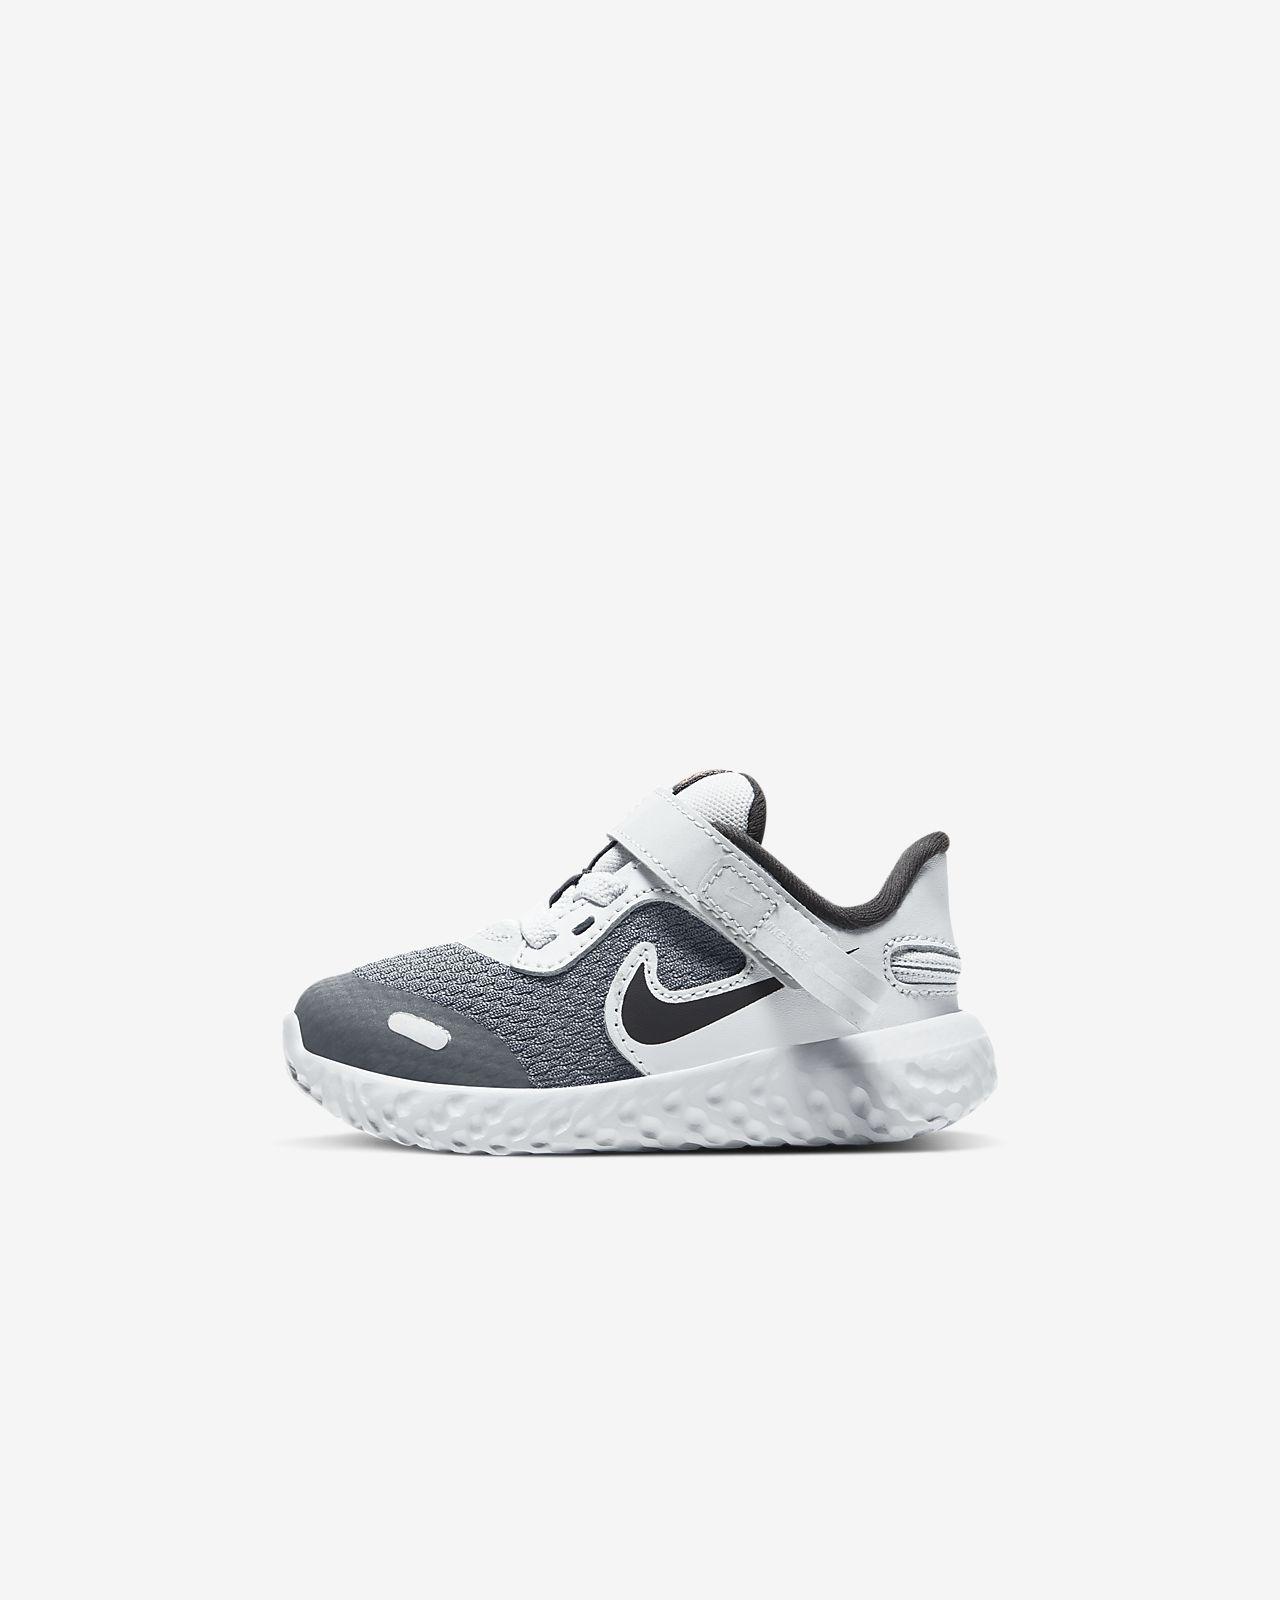 Nike Revolution 5 FlyEase sko til babyersmåbørn